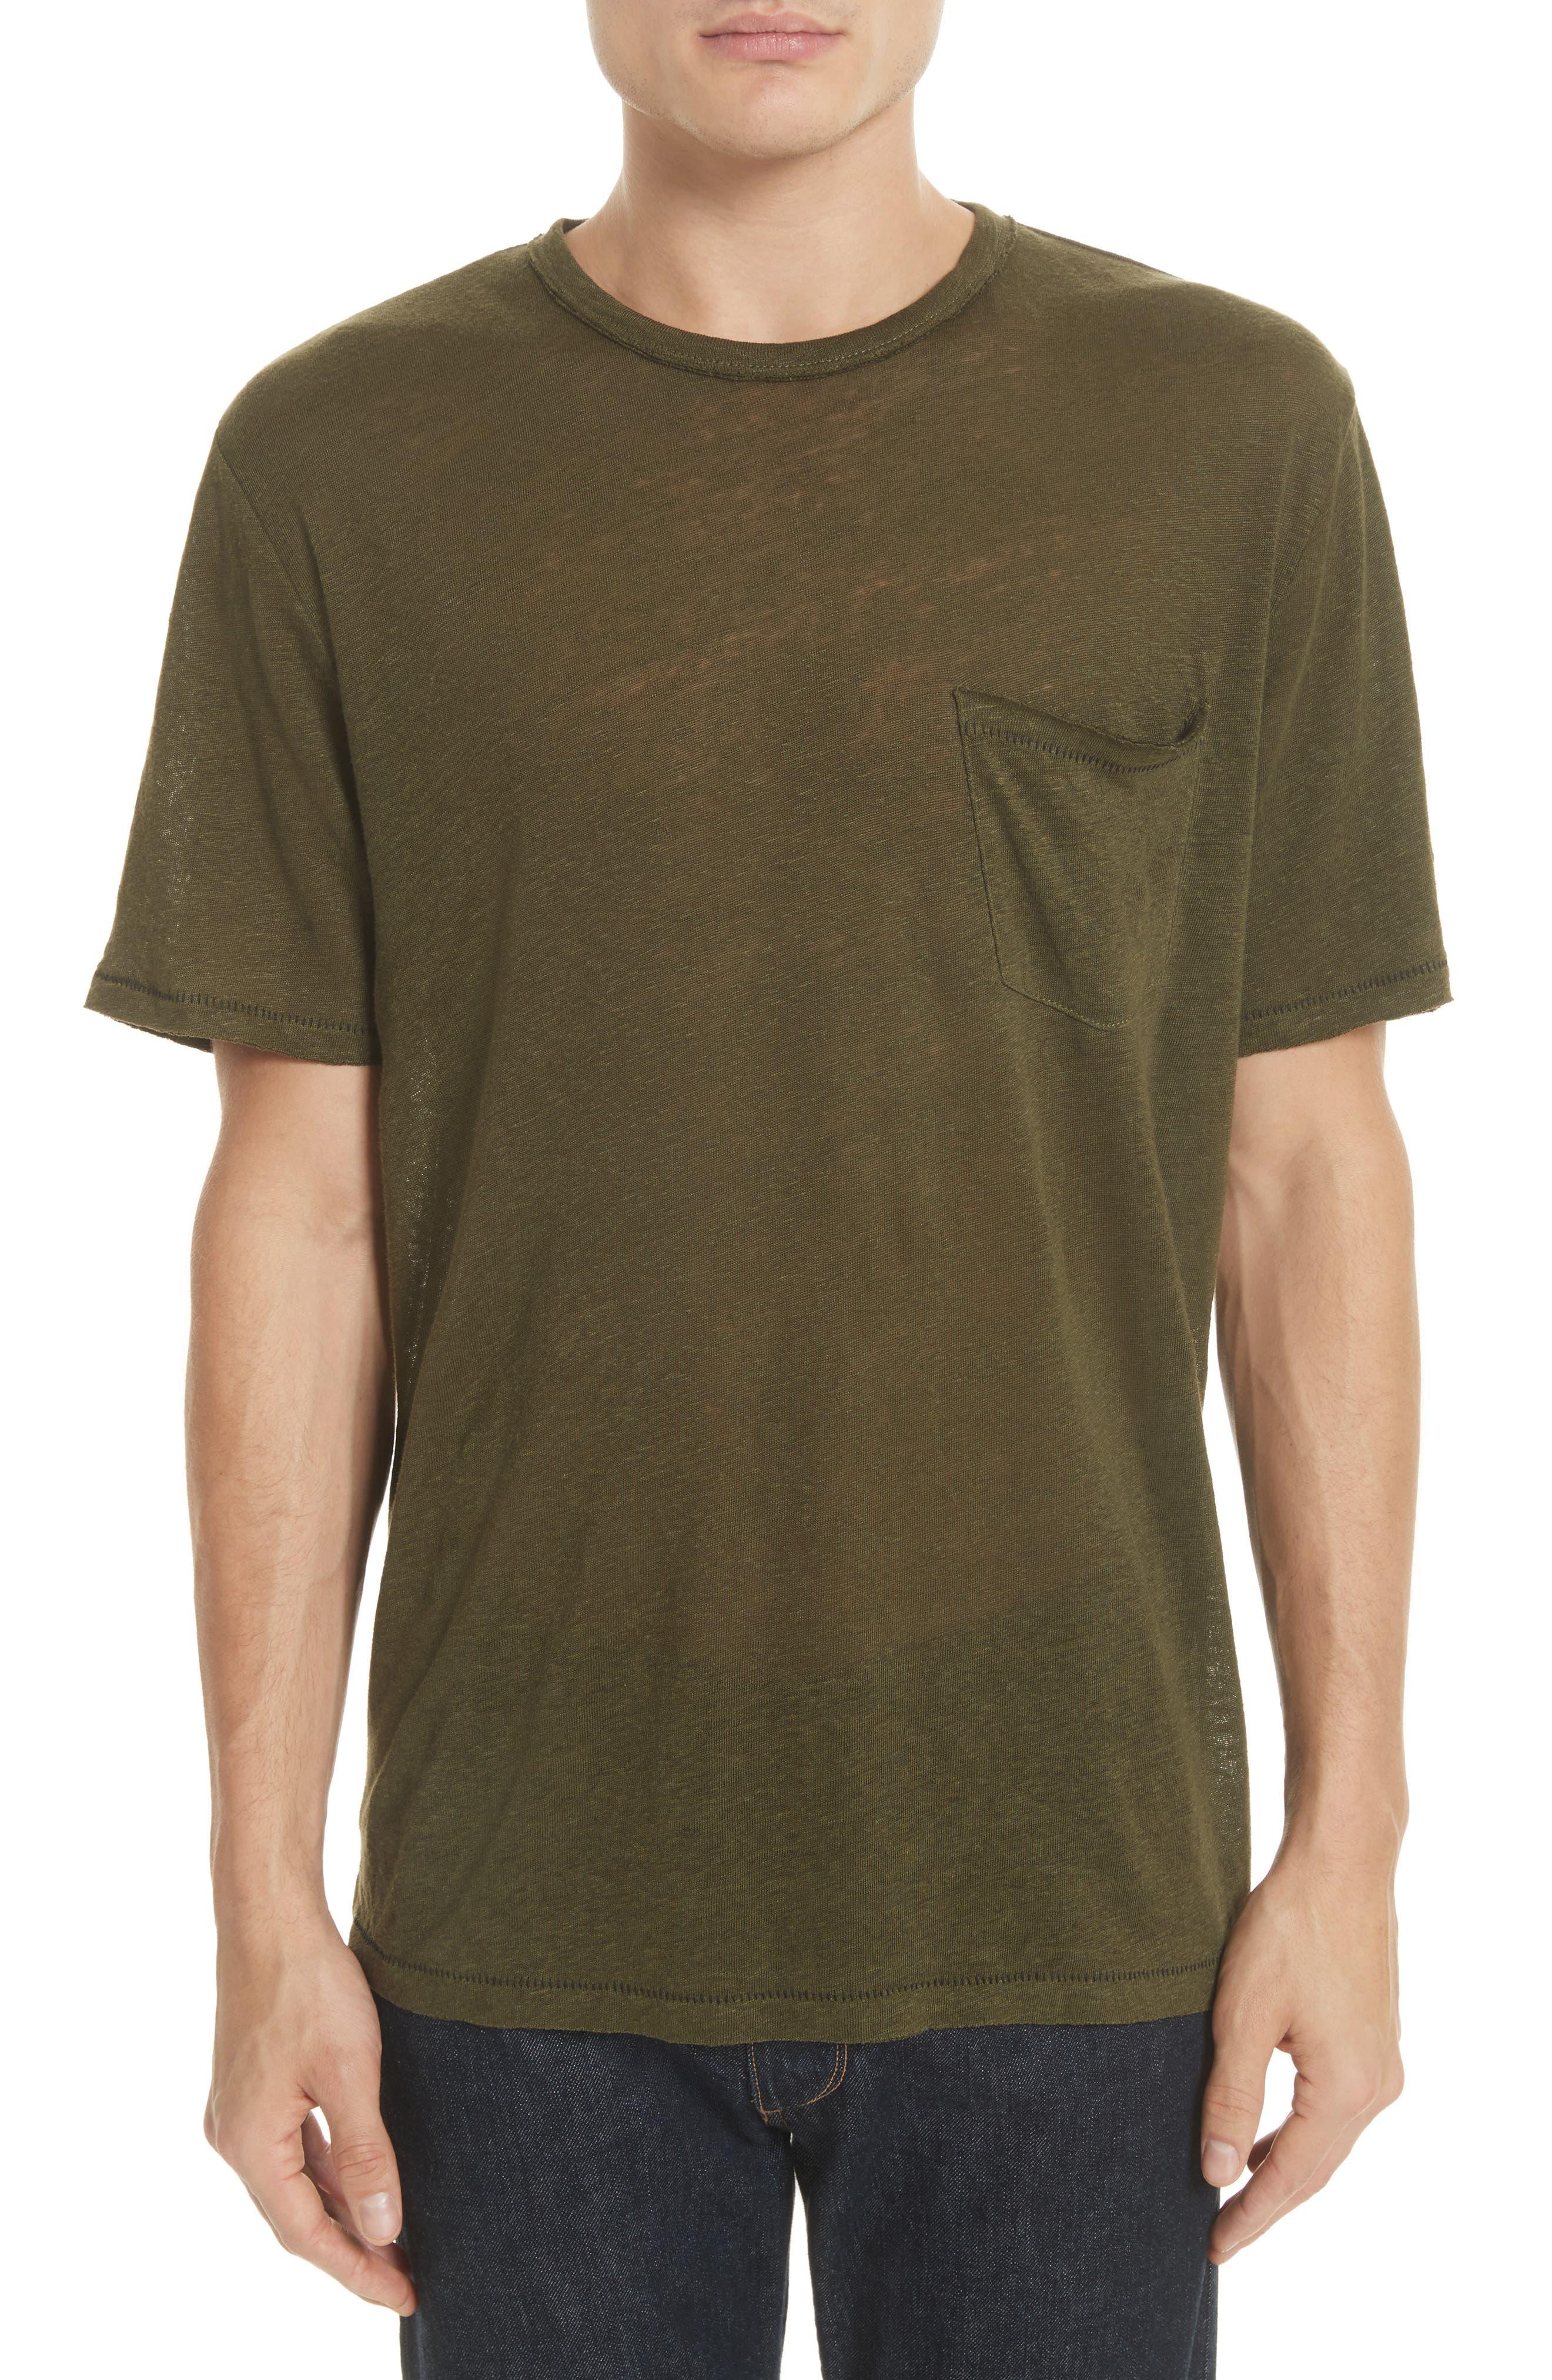 Owen T-Shirt,                             Main thumbnail 1, color,                             319